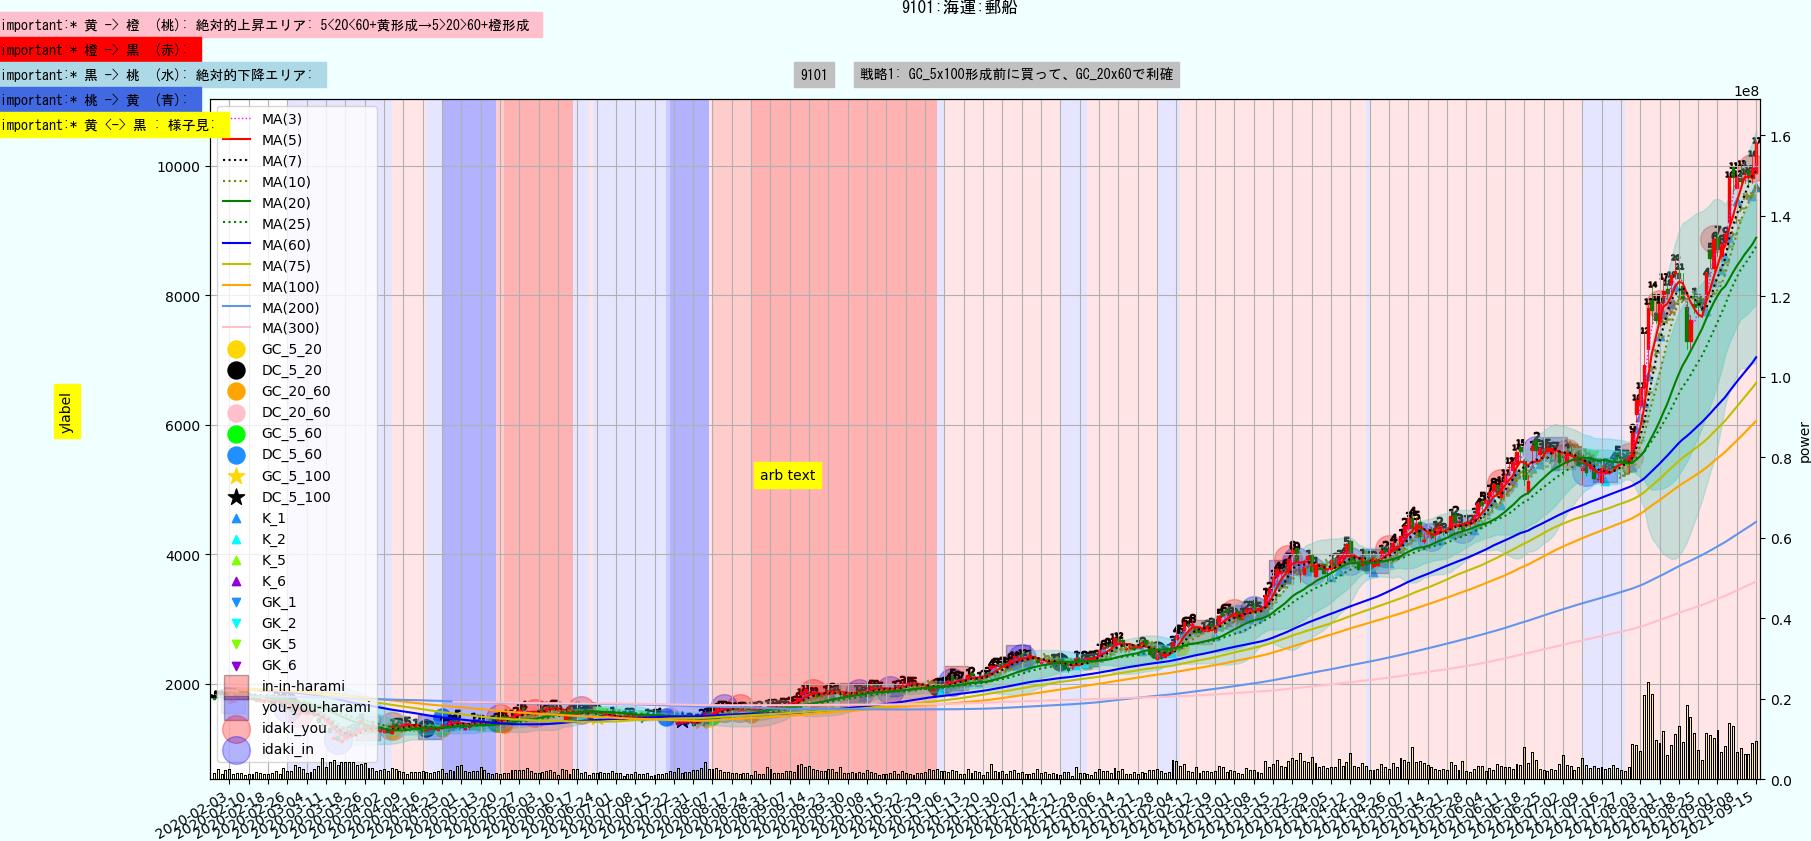 https://trident-capital-strage.s3.ap-northeast-1.amazonaws.com/charts/20210915/9101.png